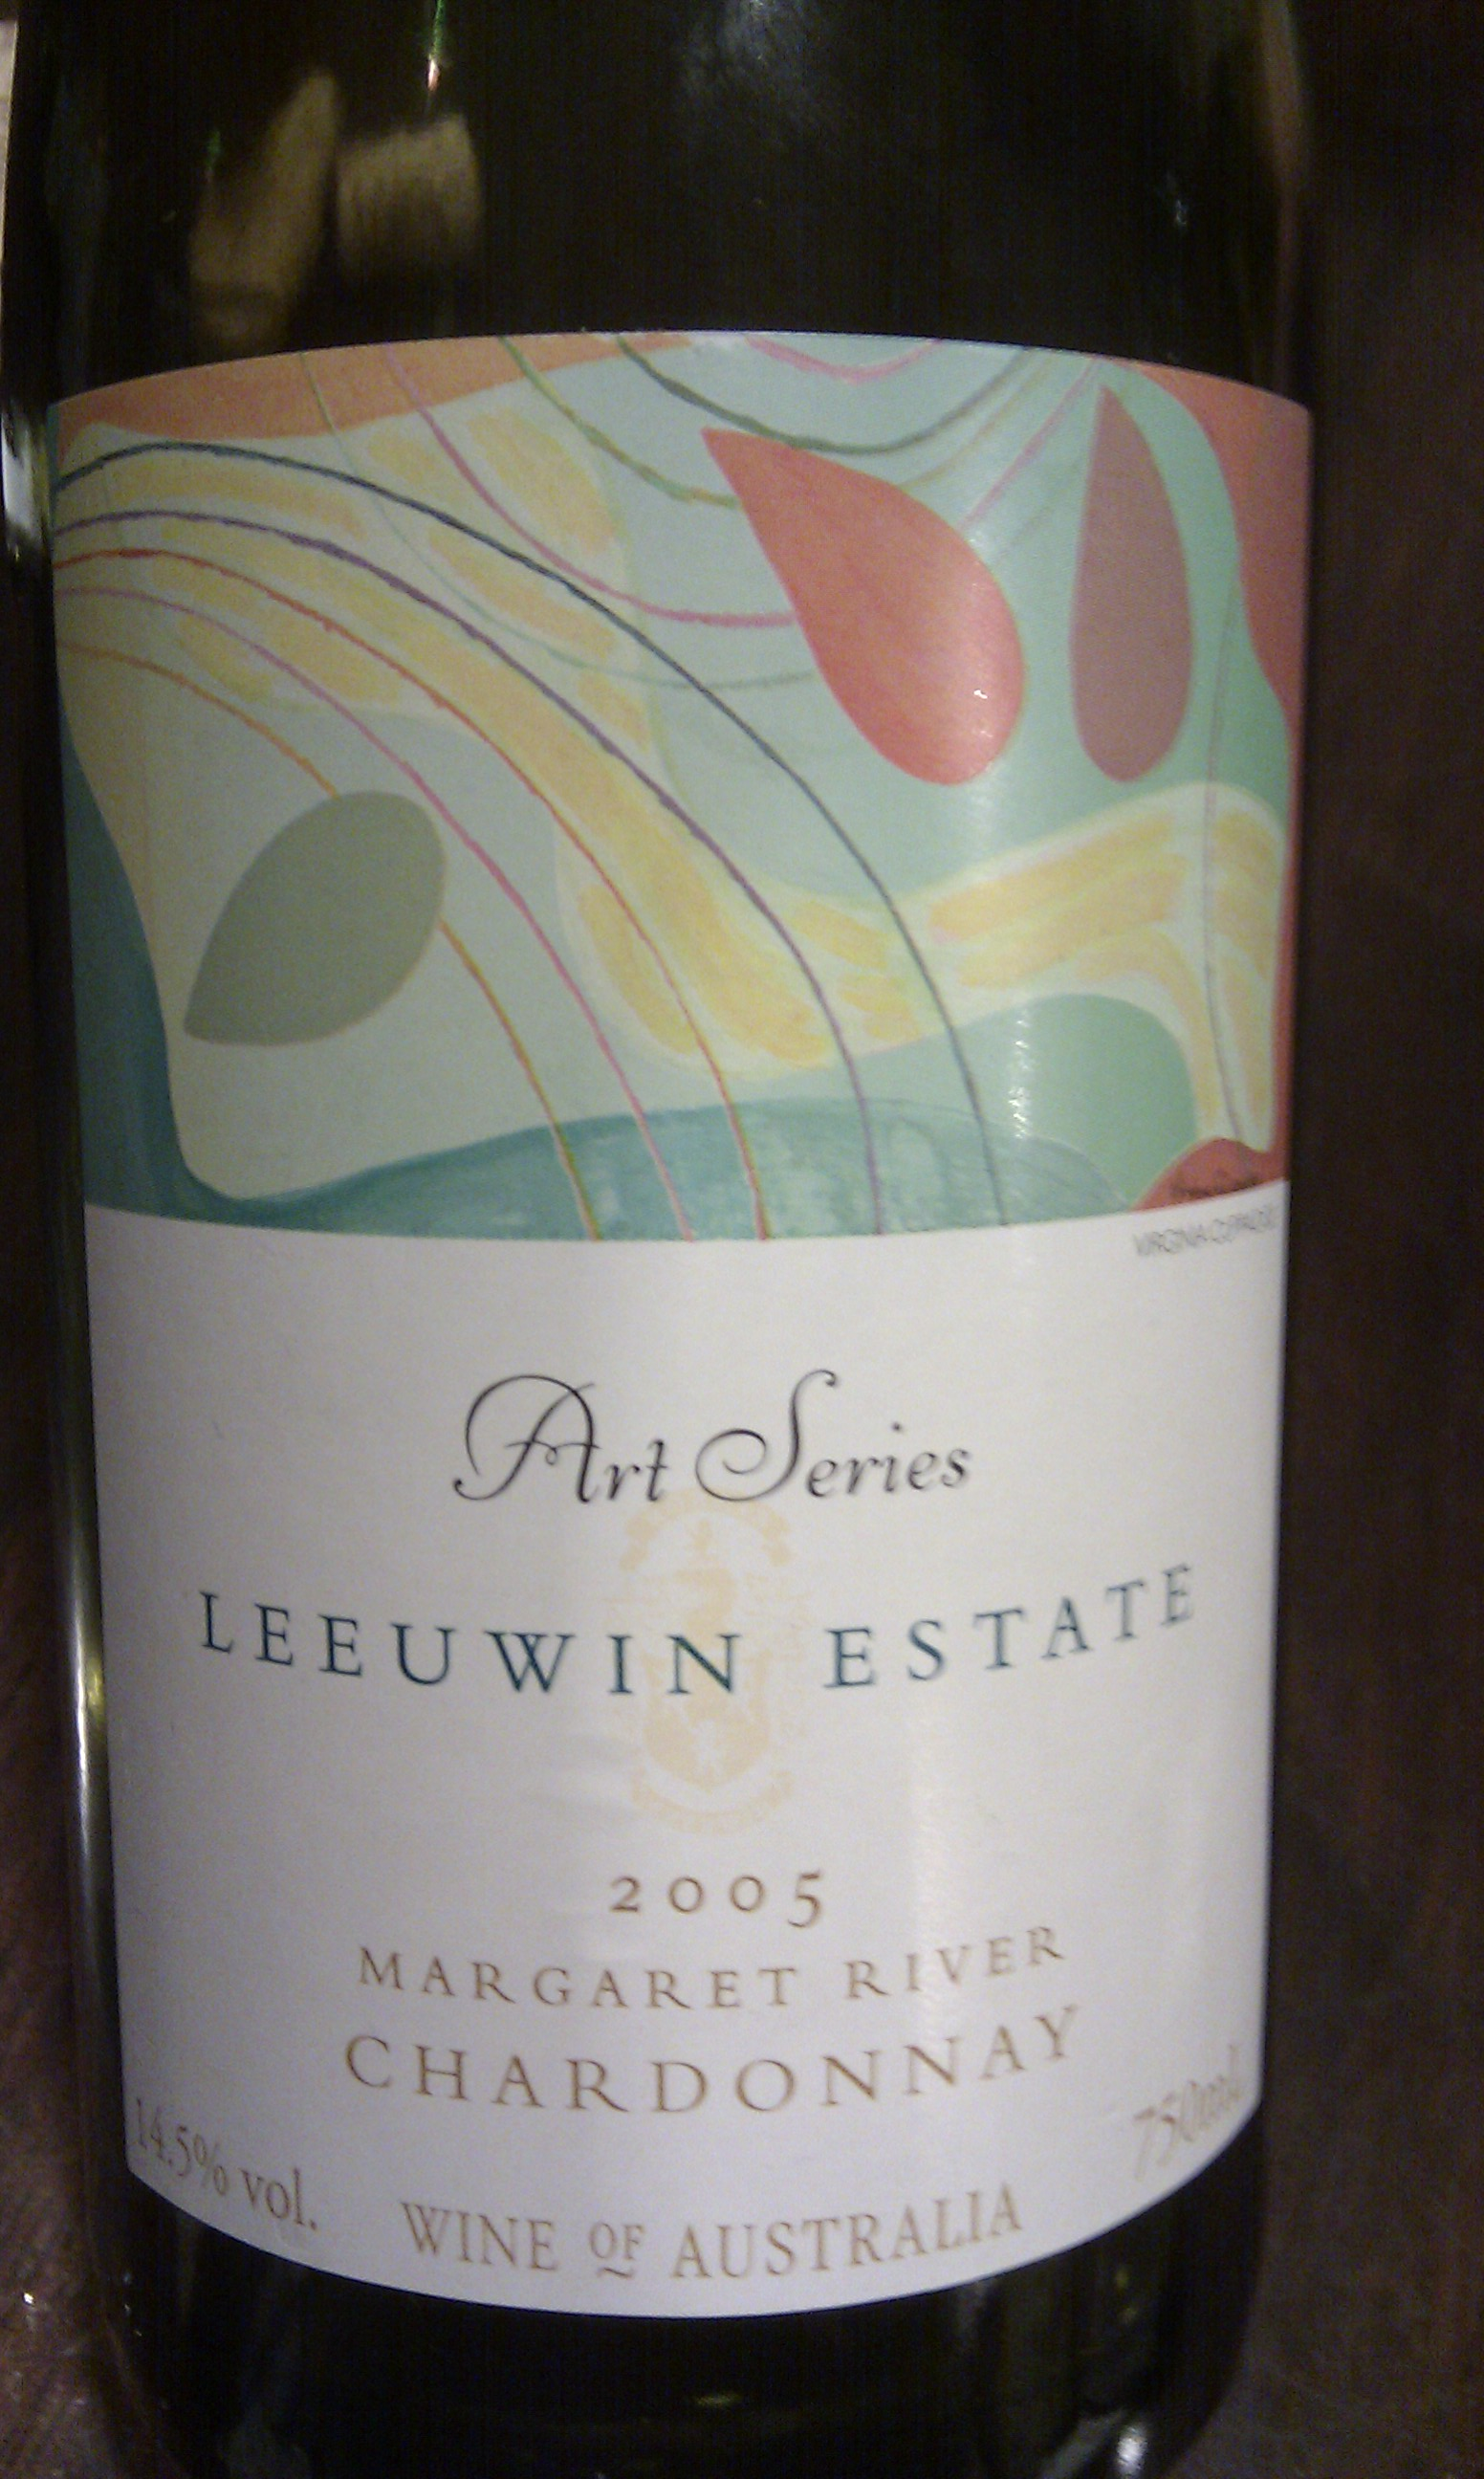 2005 Leeuwin Estate 'Art Series' Chardonnay